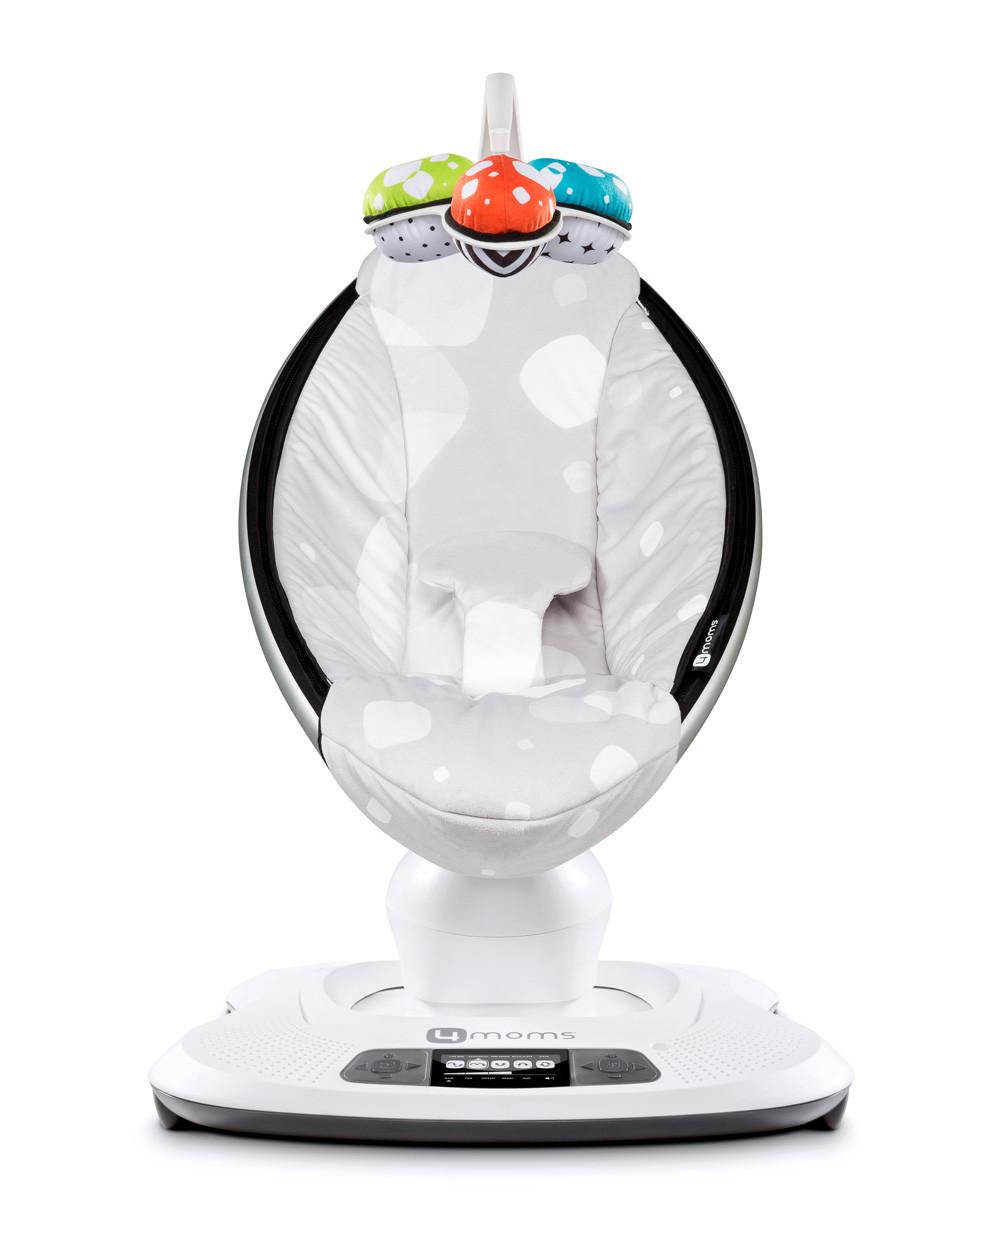 Електронний шезлонг-гойдалка 4moms MamaRoo Smart сіра в білий квадрат прокат в Харкові